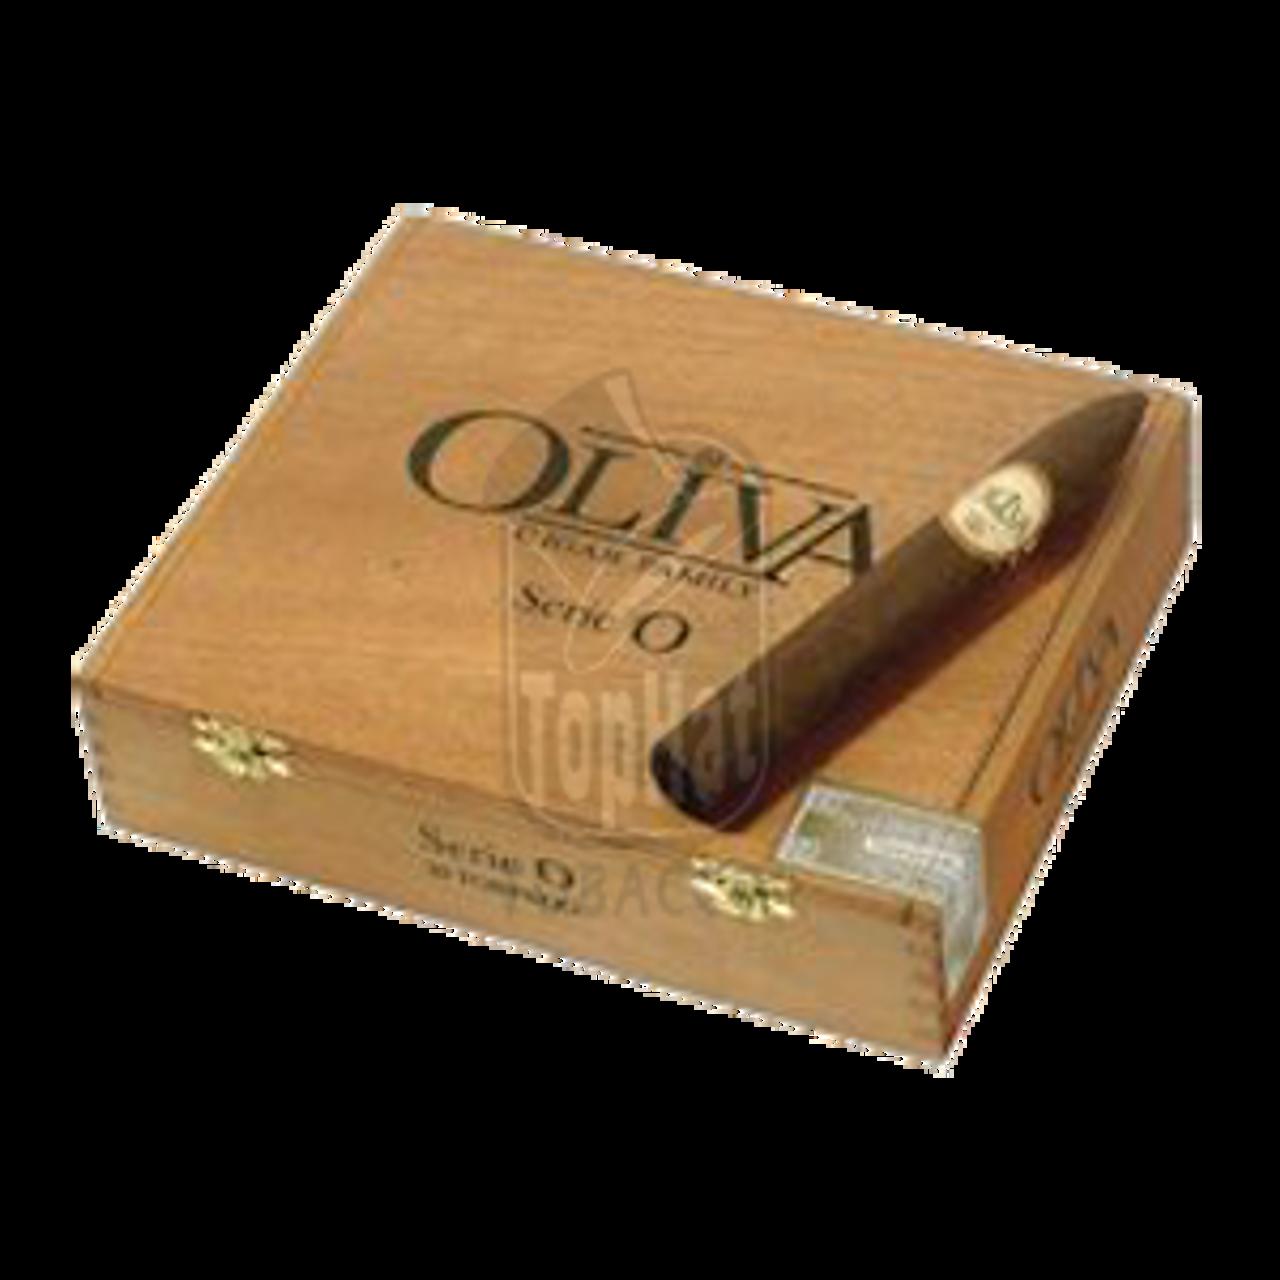 Oliva Serie O Torpedo Cigars - 6 x 52 (Box of 20)